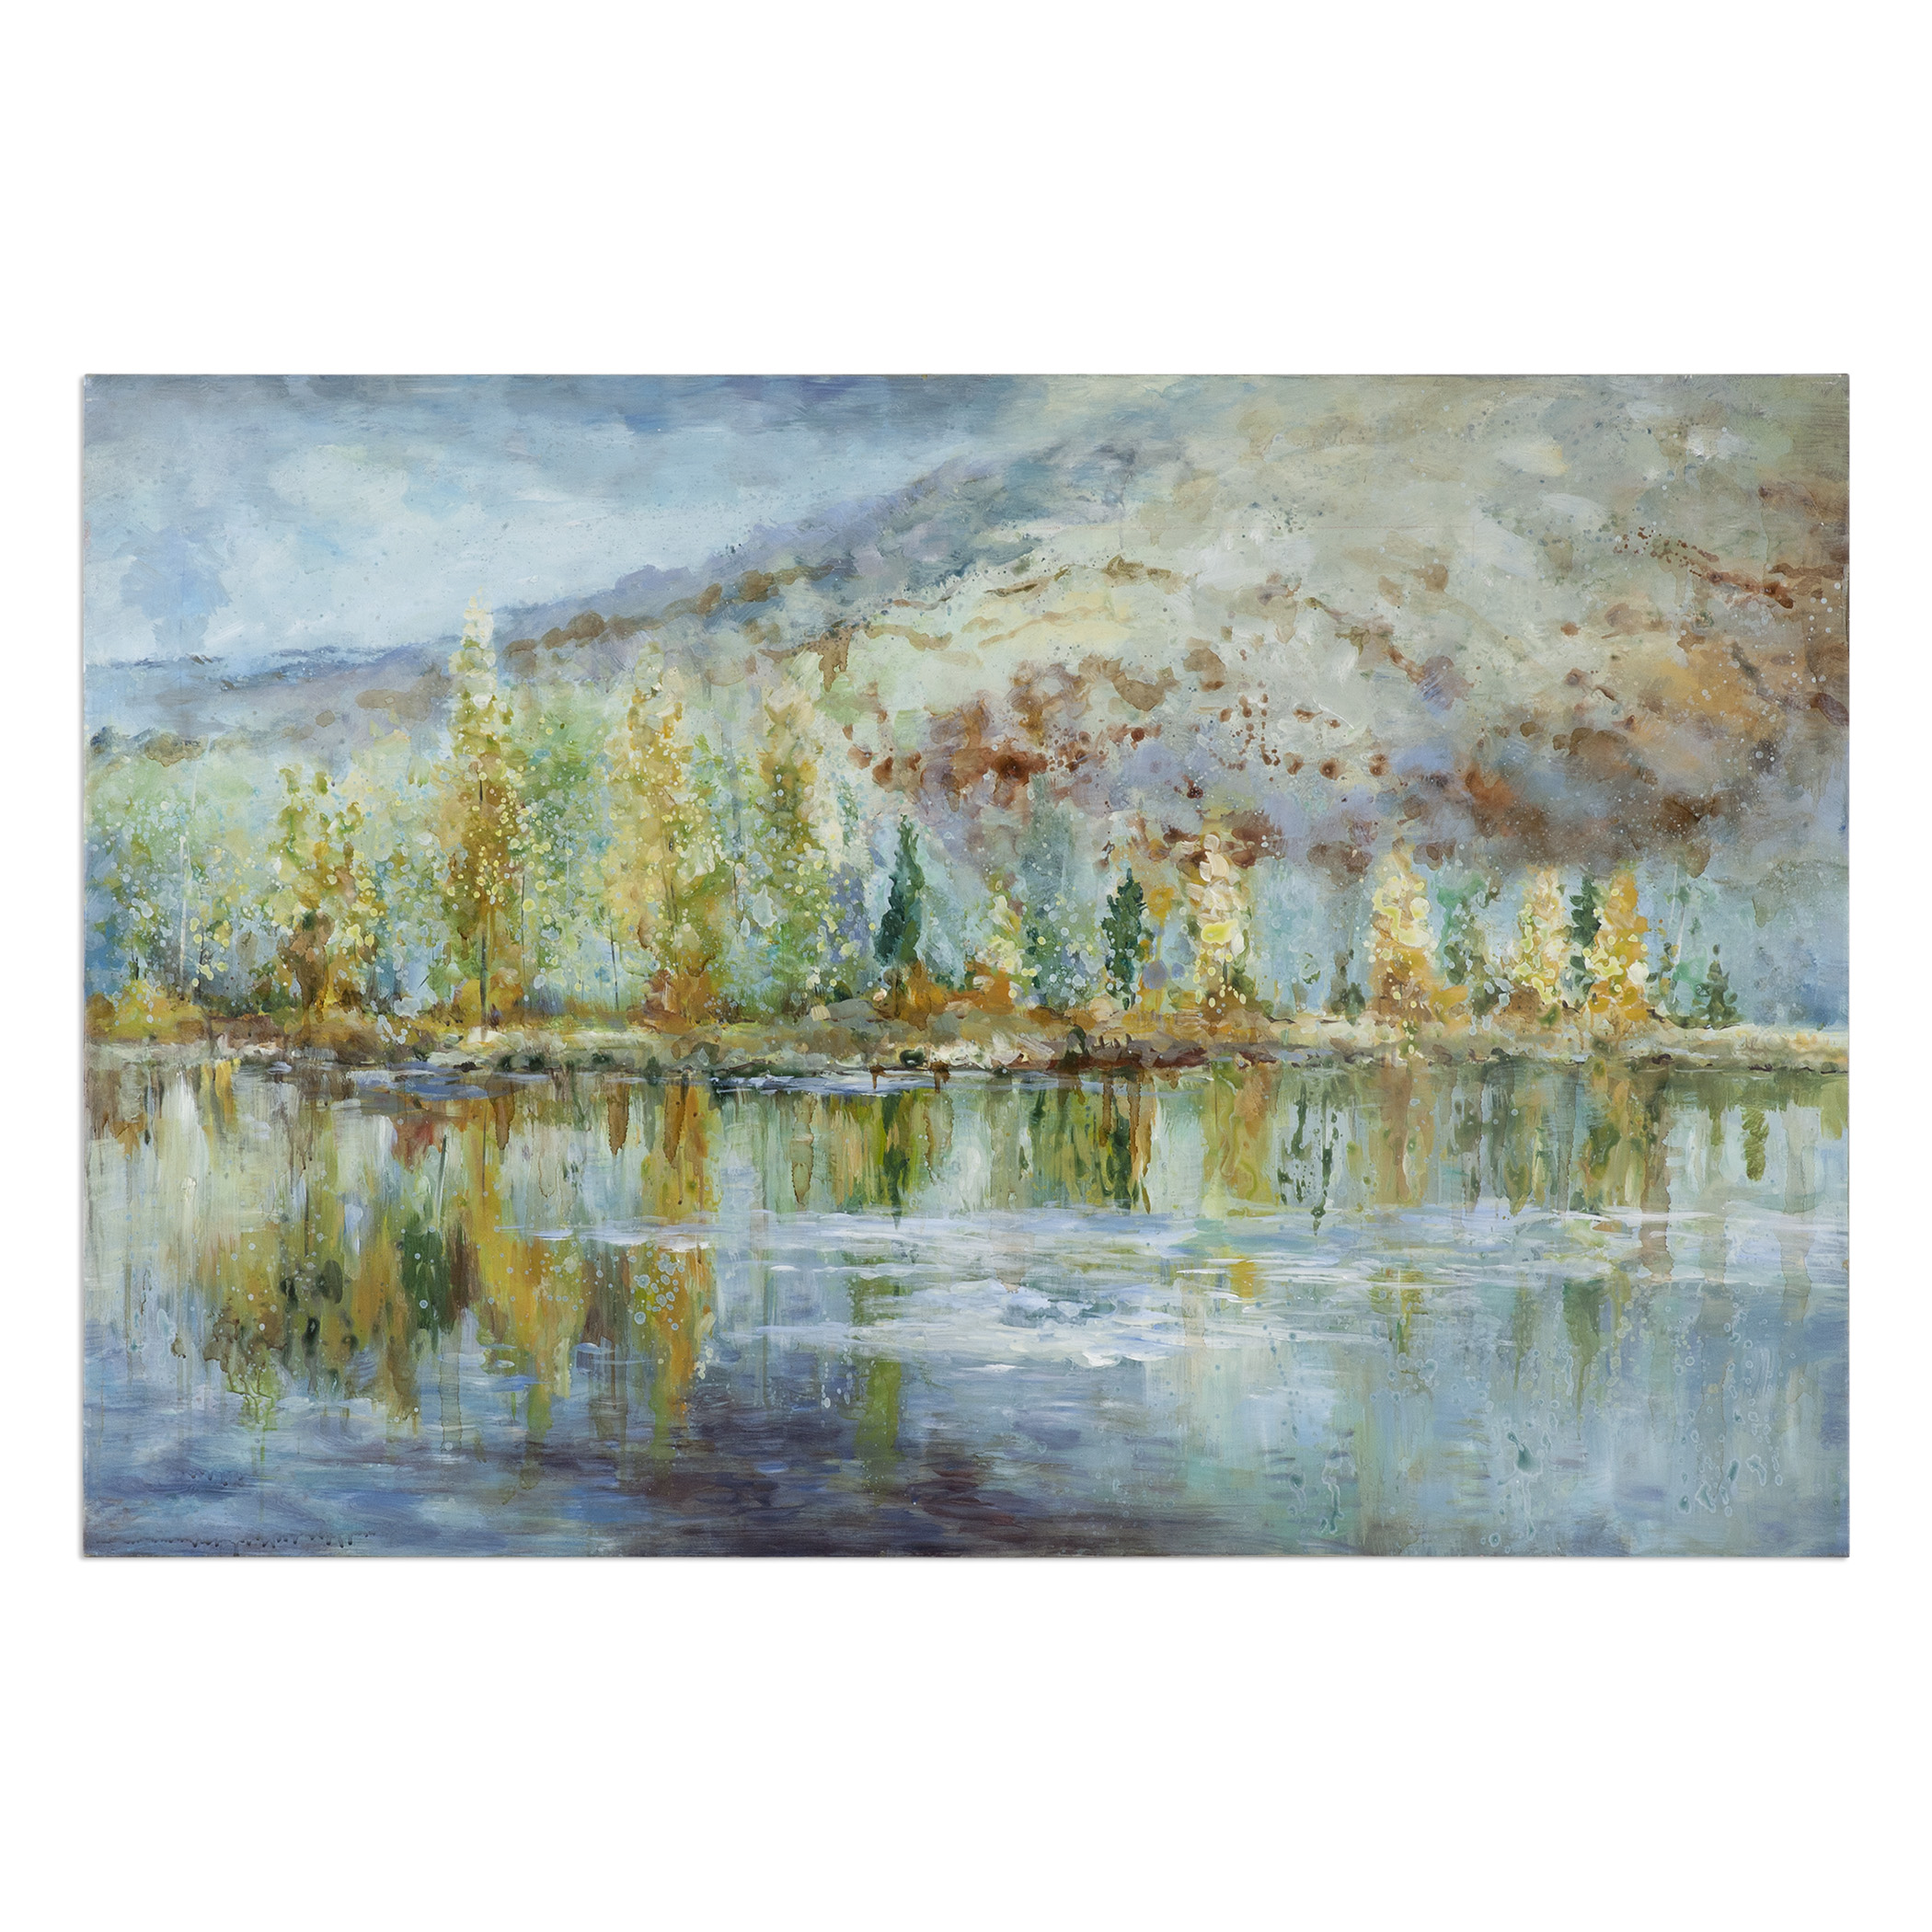 Uttermost Art Autumn Reflection Landscape Art - Item Number: 34355